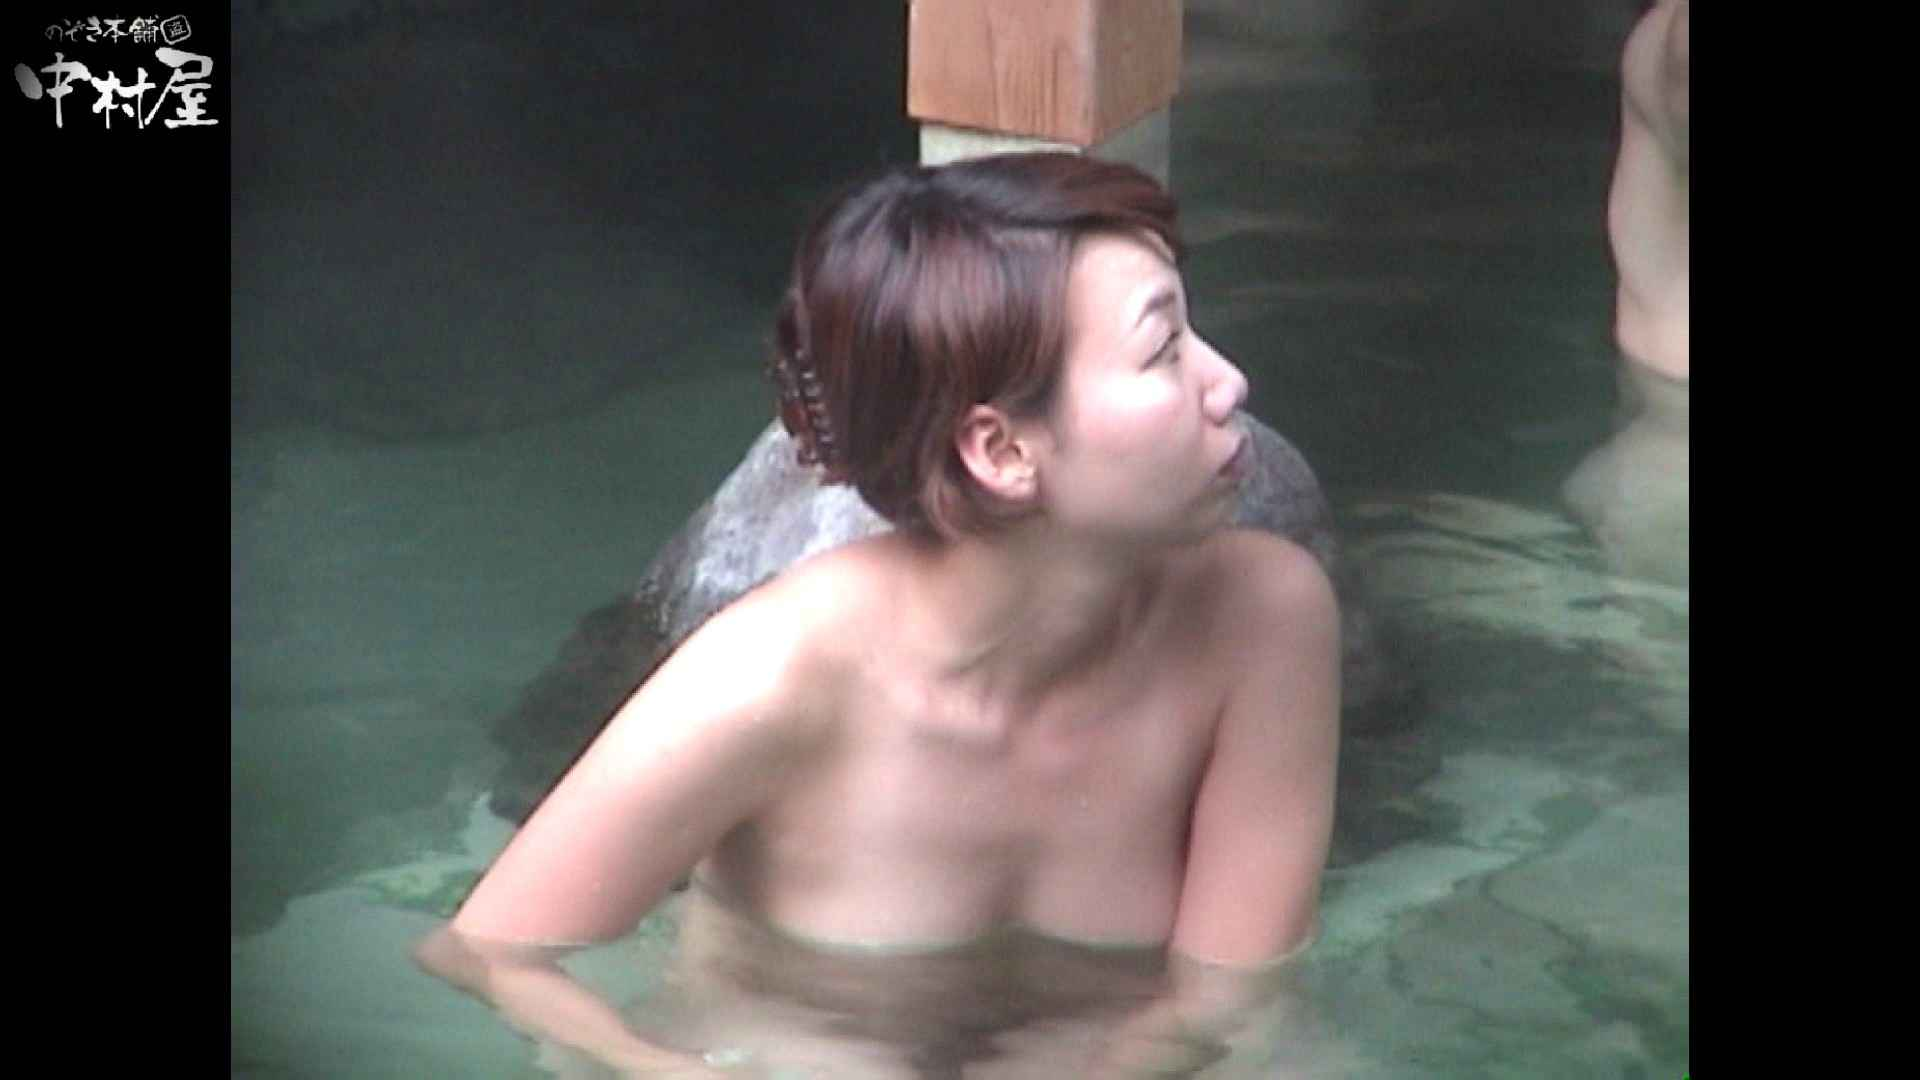 Aquaな露天風呂Vol.951 盗撮映像  93Pix 6